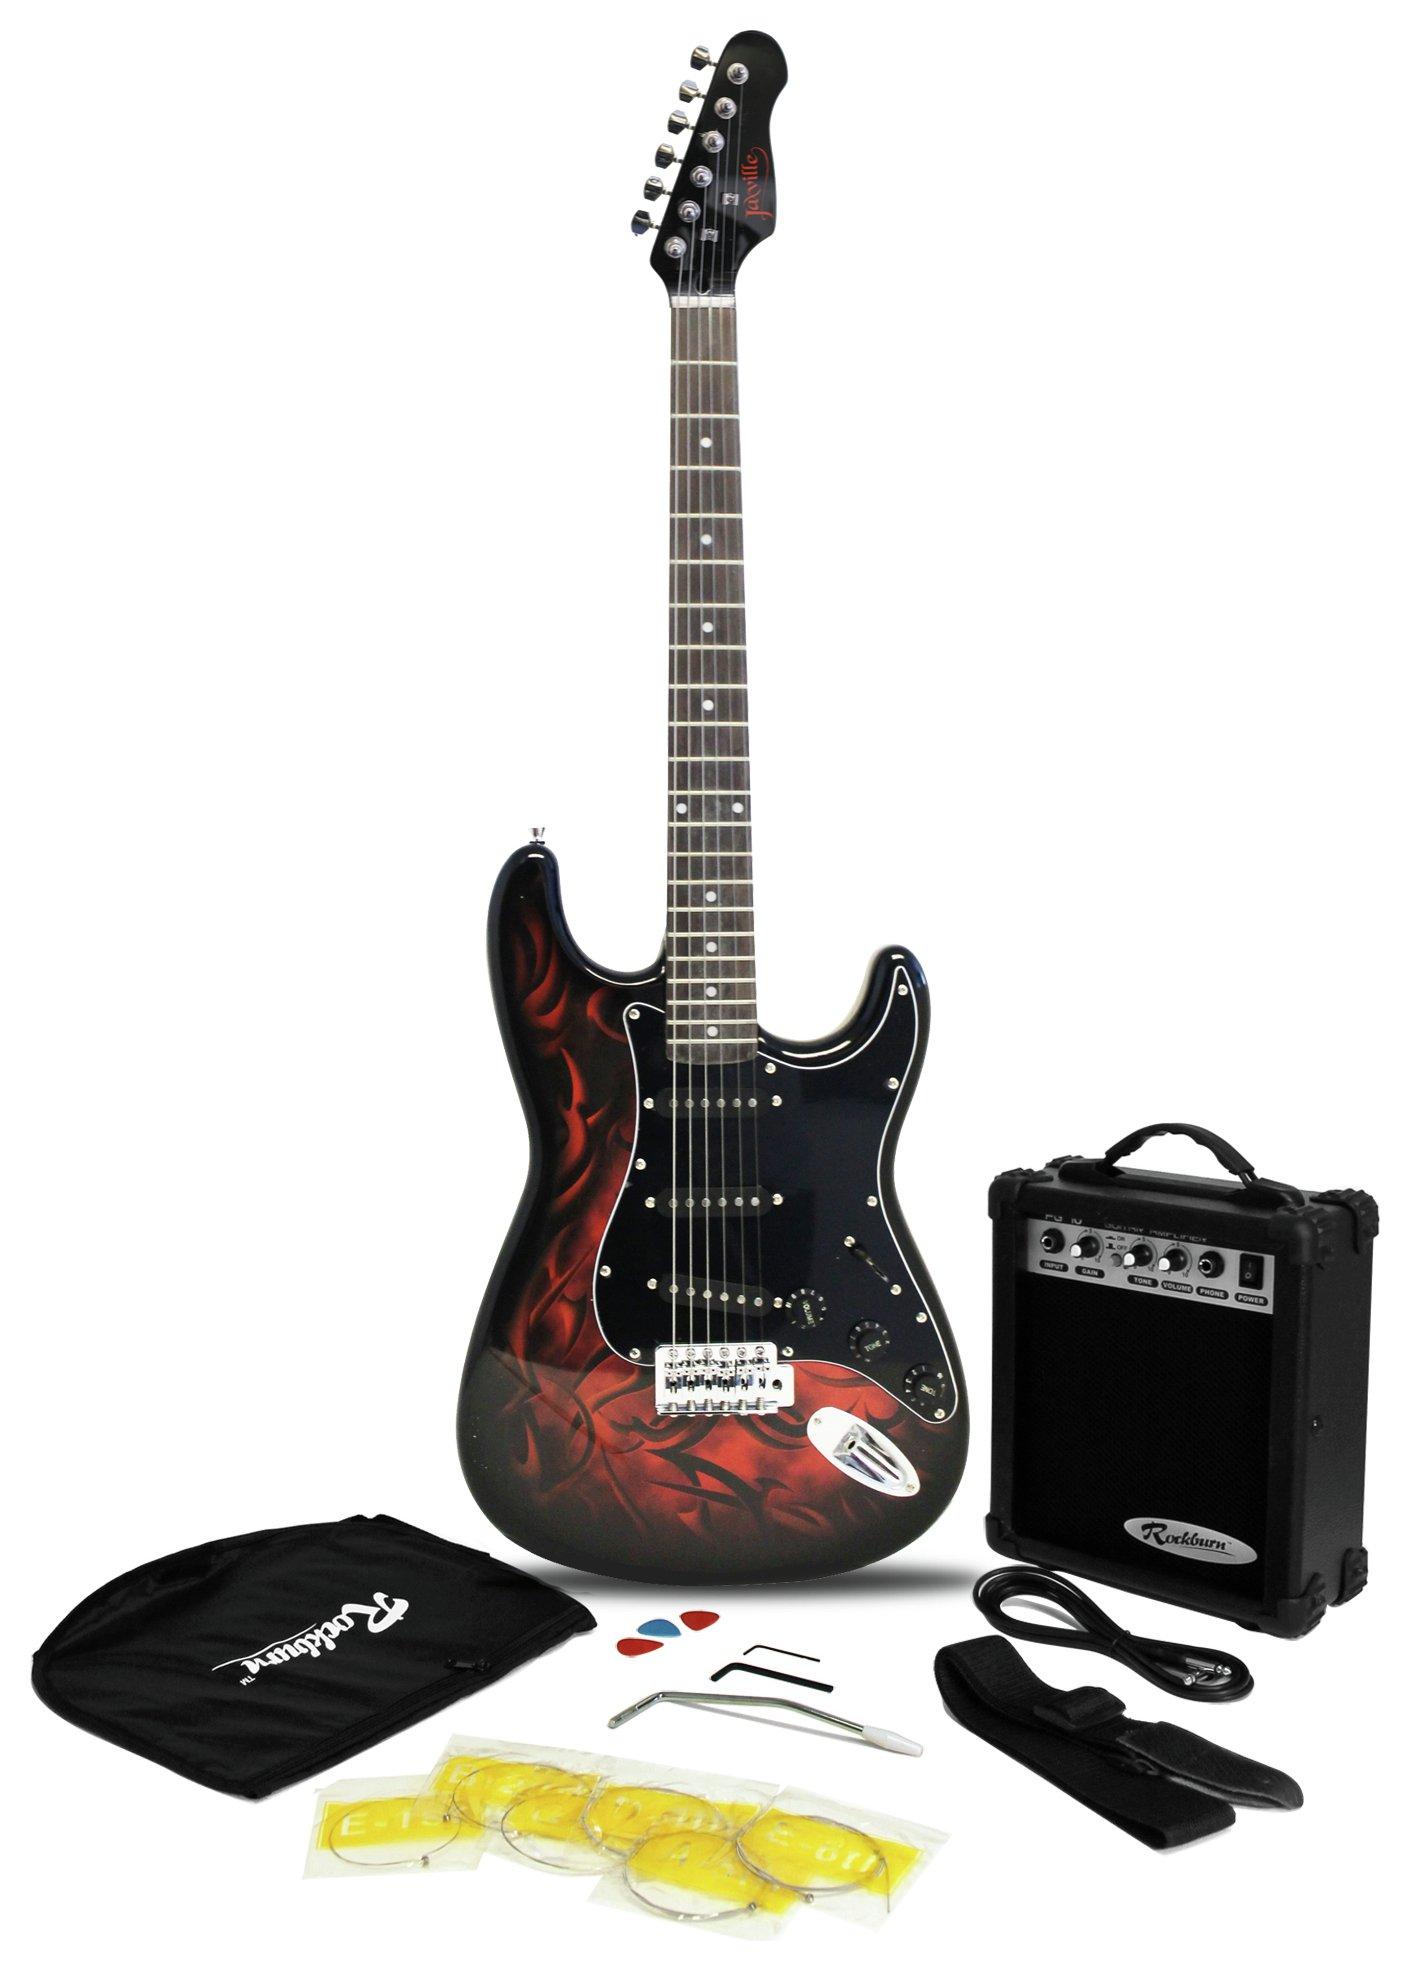 Jaxville Electric Guitar Pack - Demon